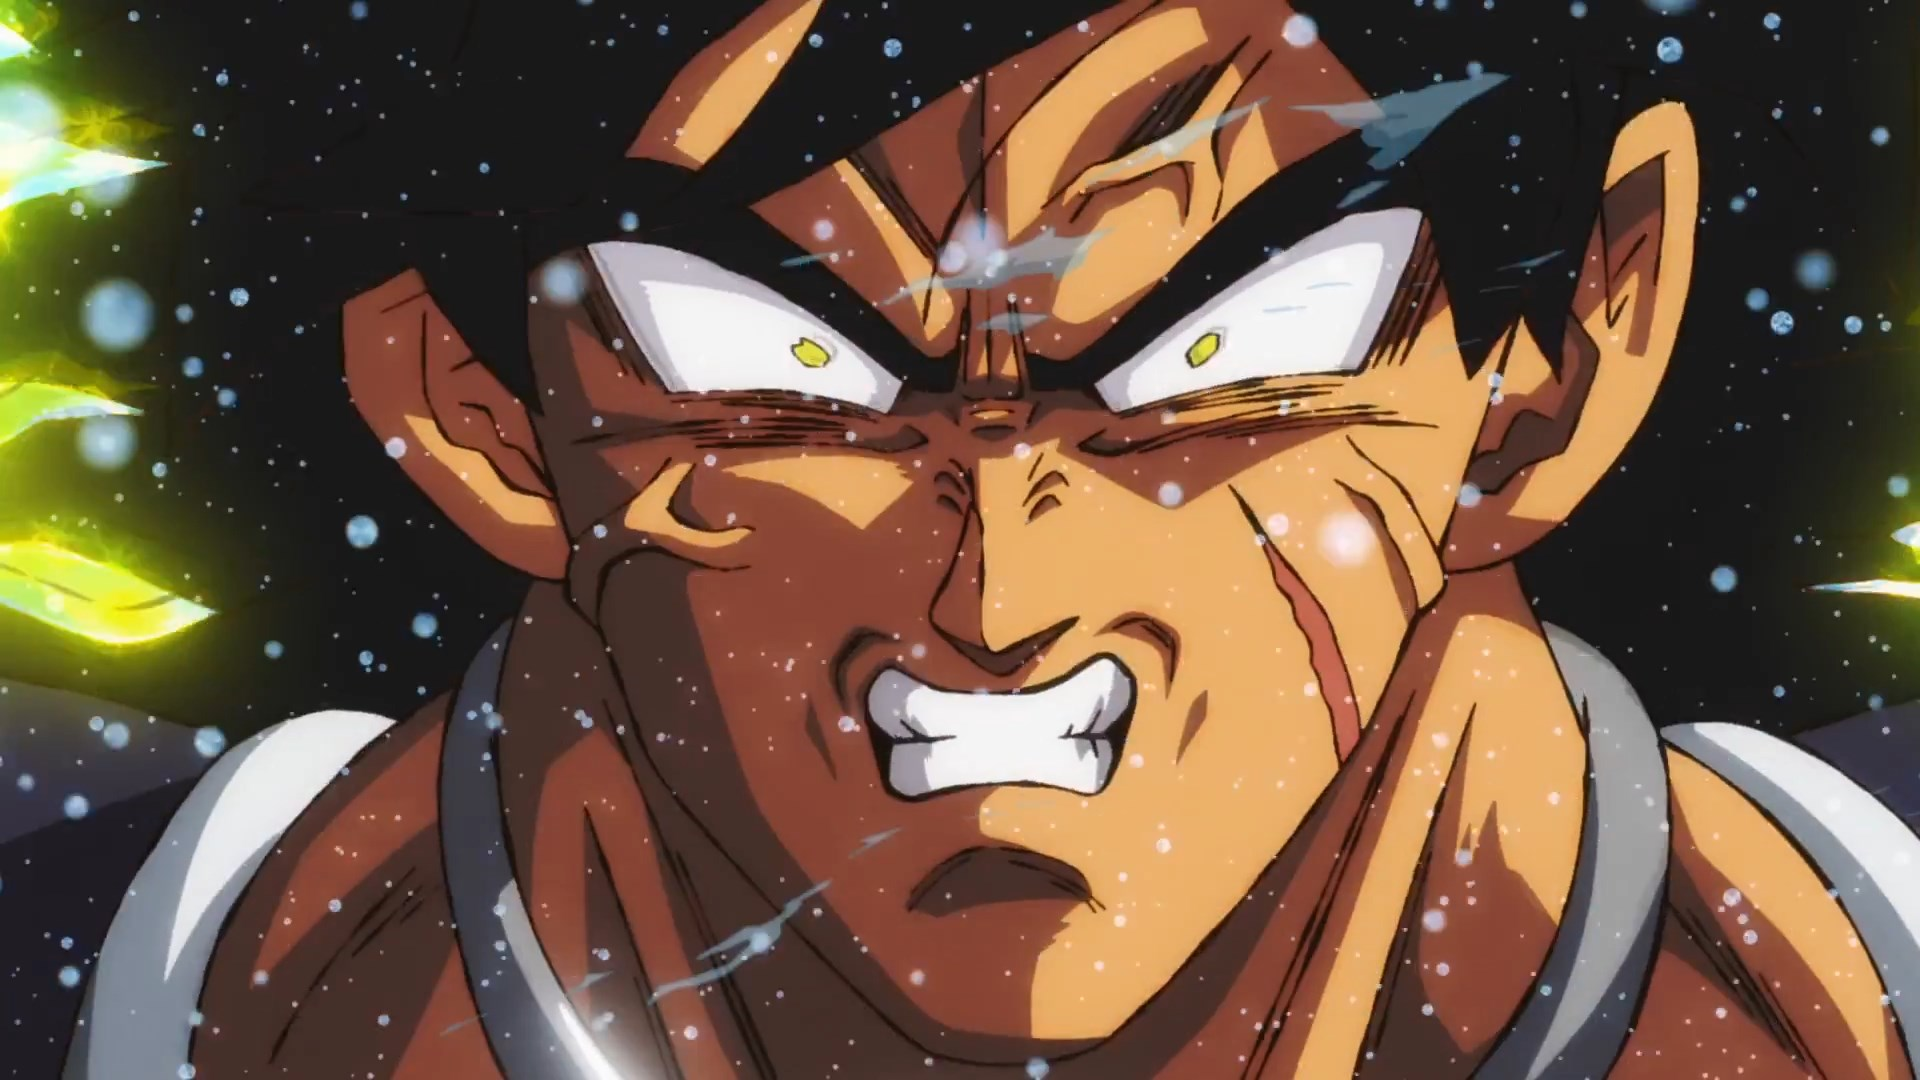 Dragon Ball Super Broly Le Plein D Images Hd Du Trailer 3 Dragon